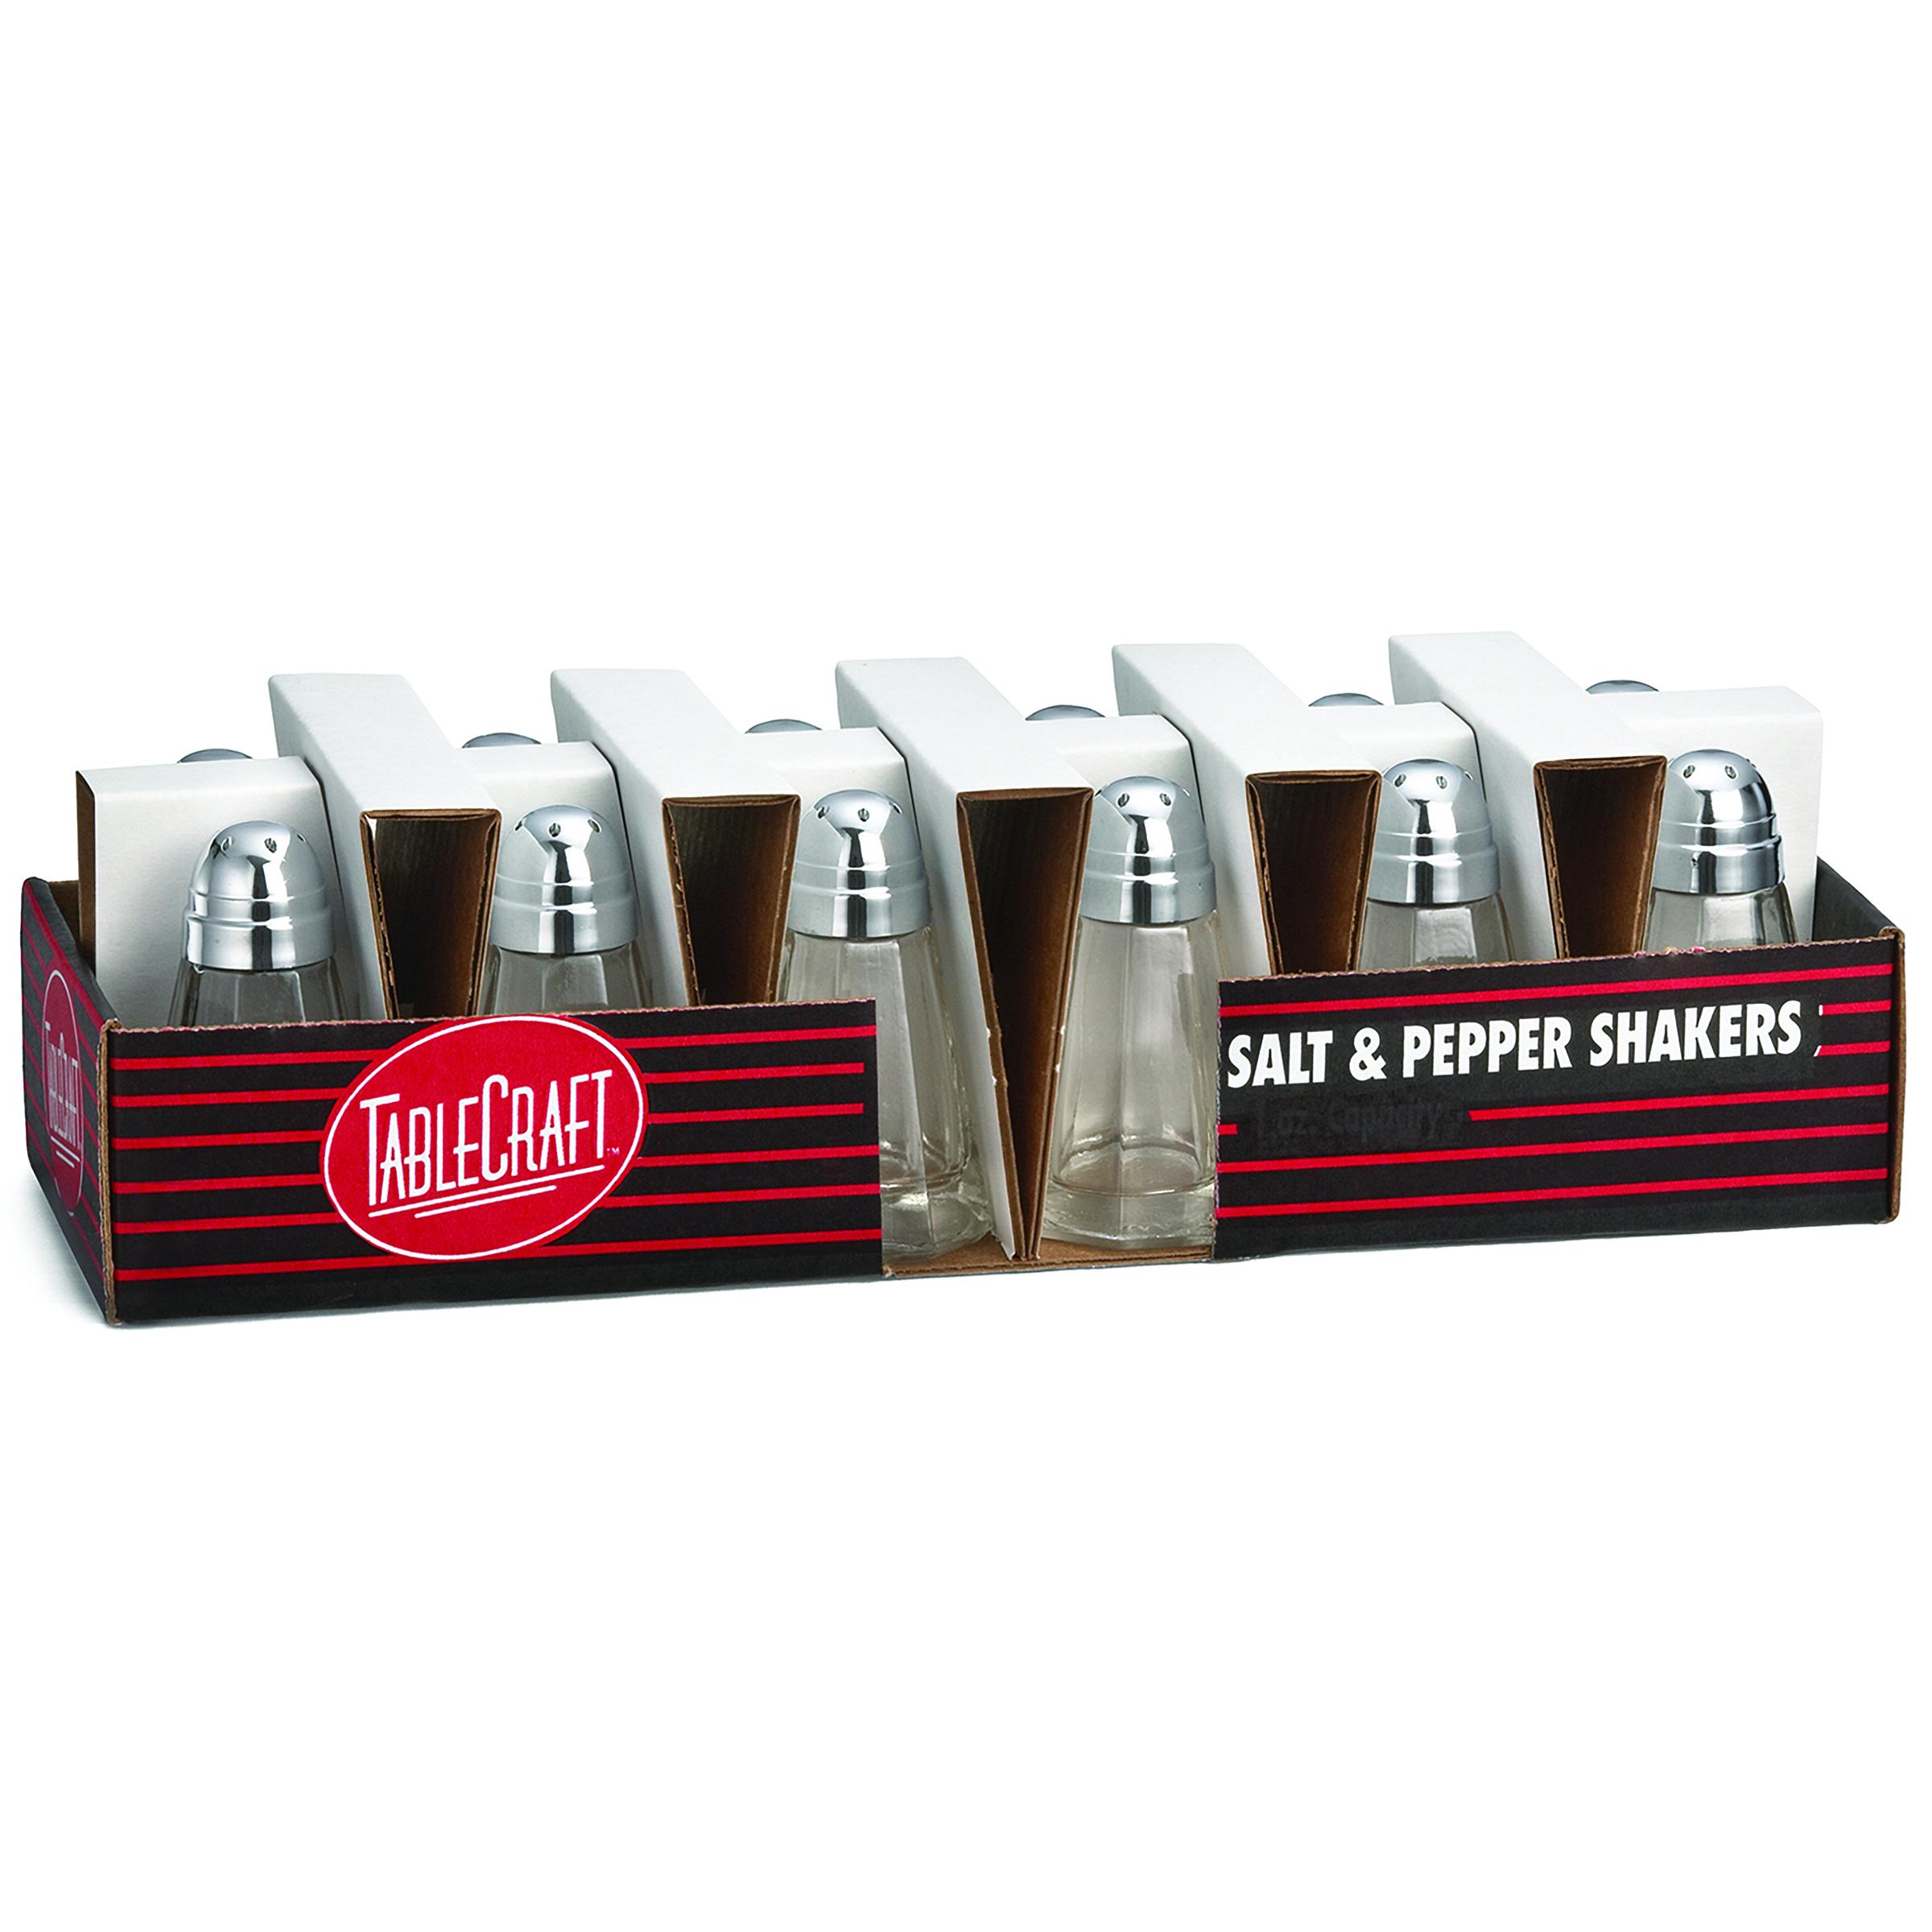 TableCraft Products C80-12 salt / pepper shaker